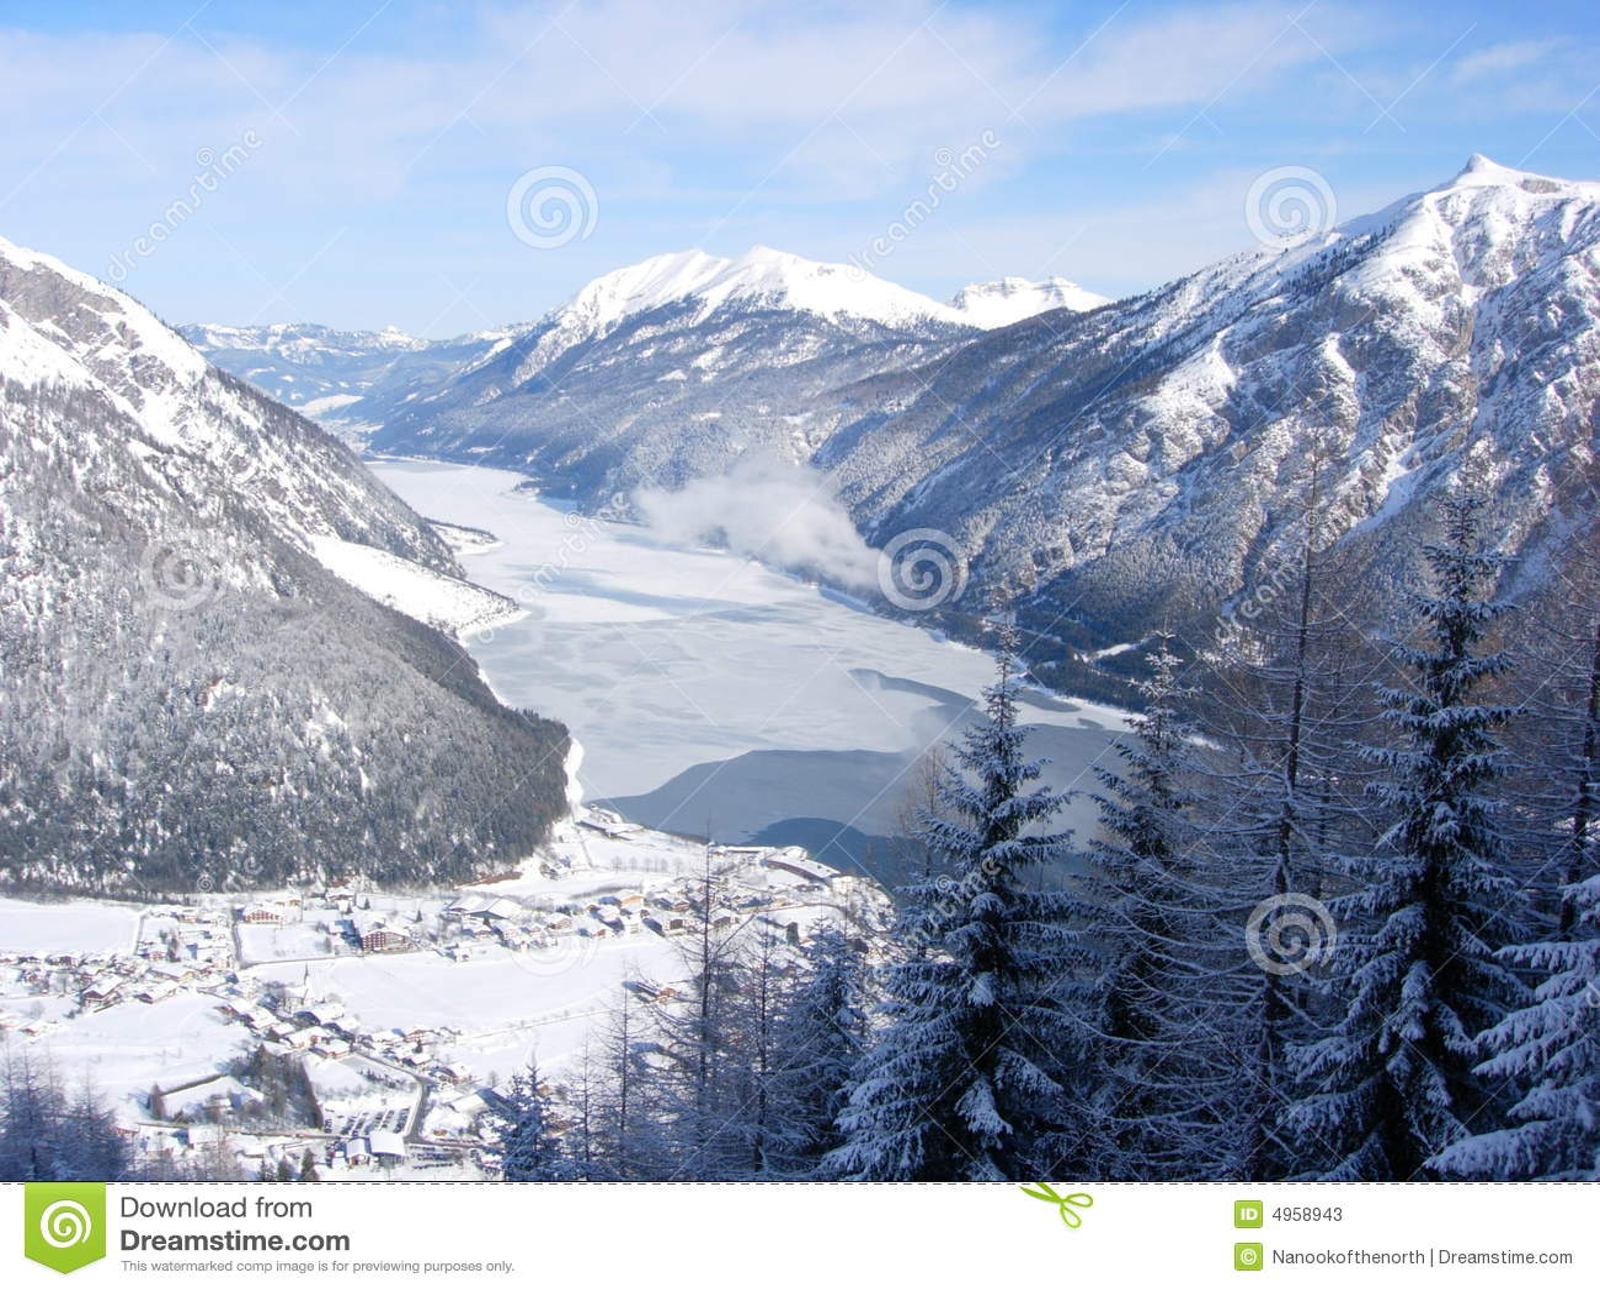 Aerial view of the Achensee, Austria